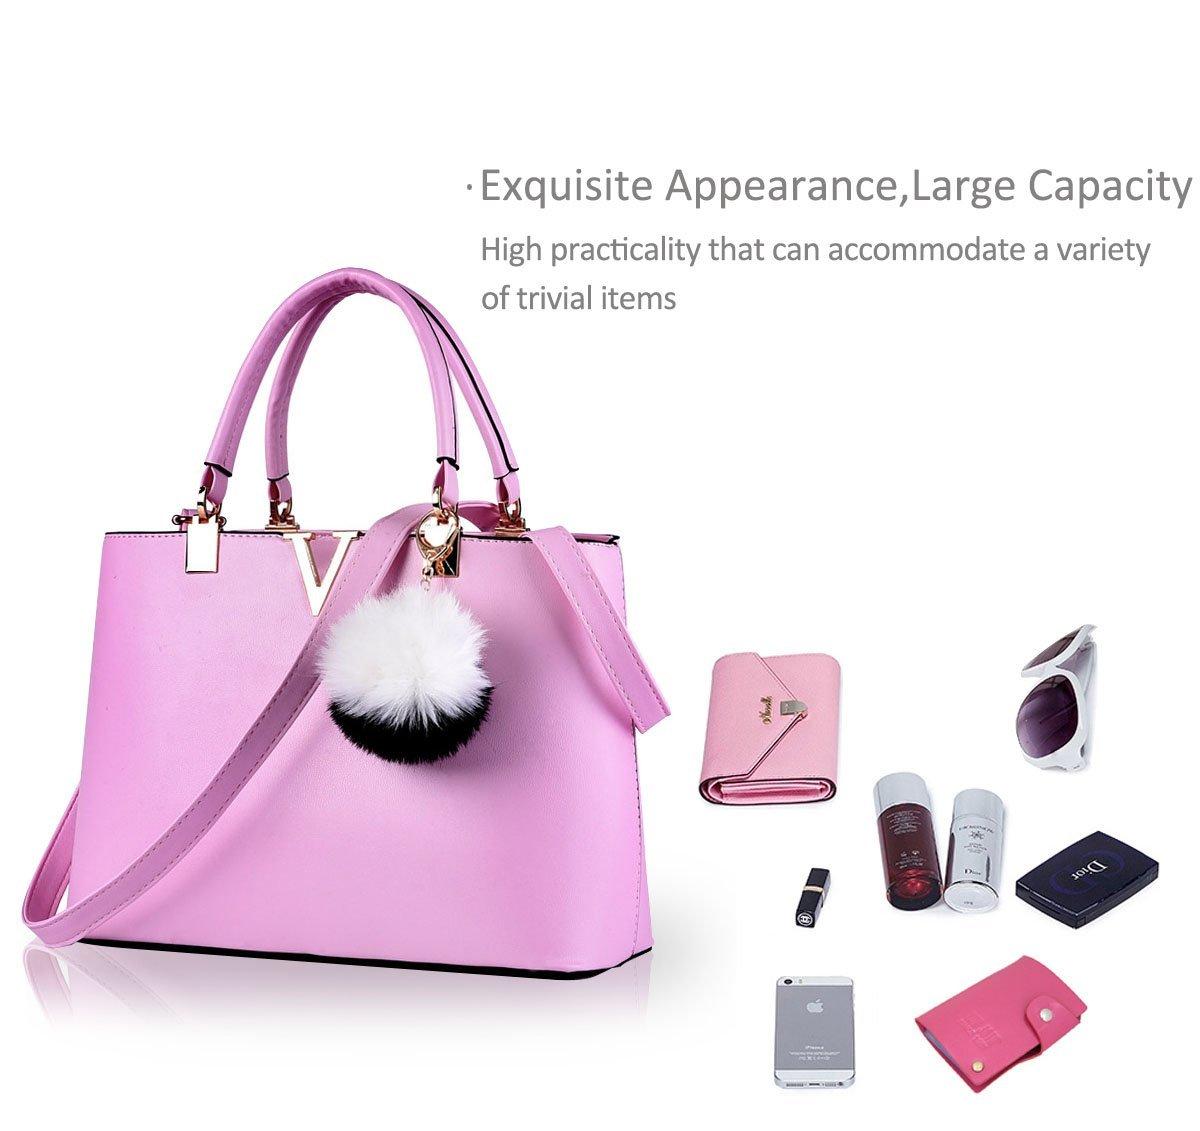 NICOLE & DORIS For Women's Casual Shoulder Cross Body Bags Spring 2017 Spring New Trends Minimal Fashion Handbags (Purple) by NICOLE & DORIS (Image #5)